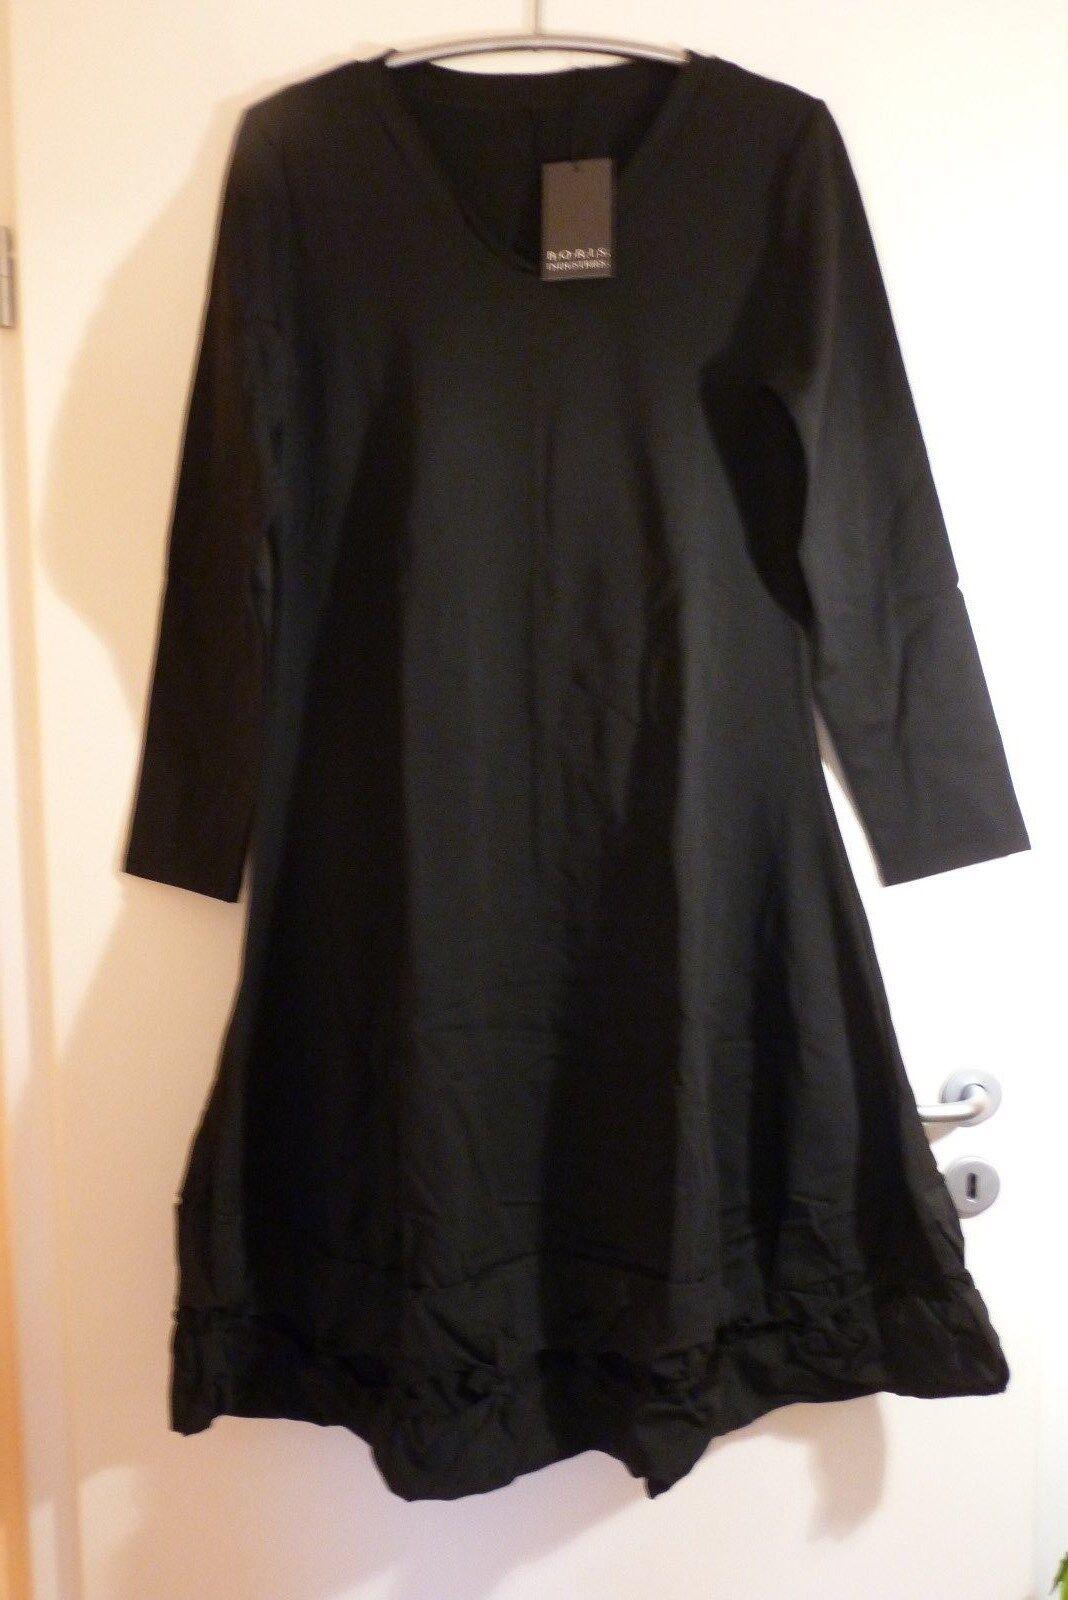 BORIS INDUSTRIES Knotensaum Kleid 46 48 NEU LAGENLOOK schwarz A-Form Stretch